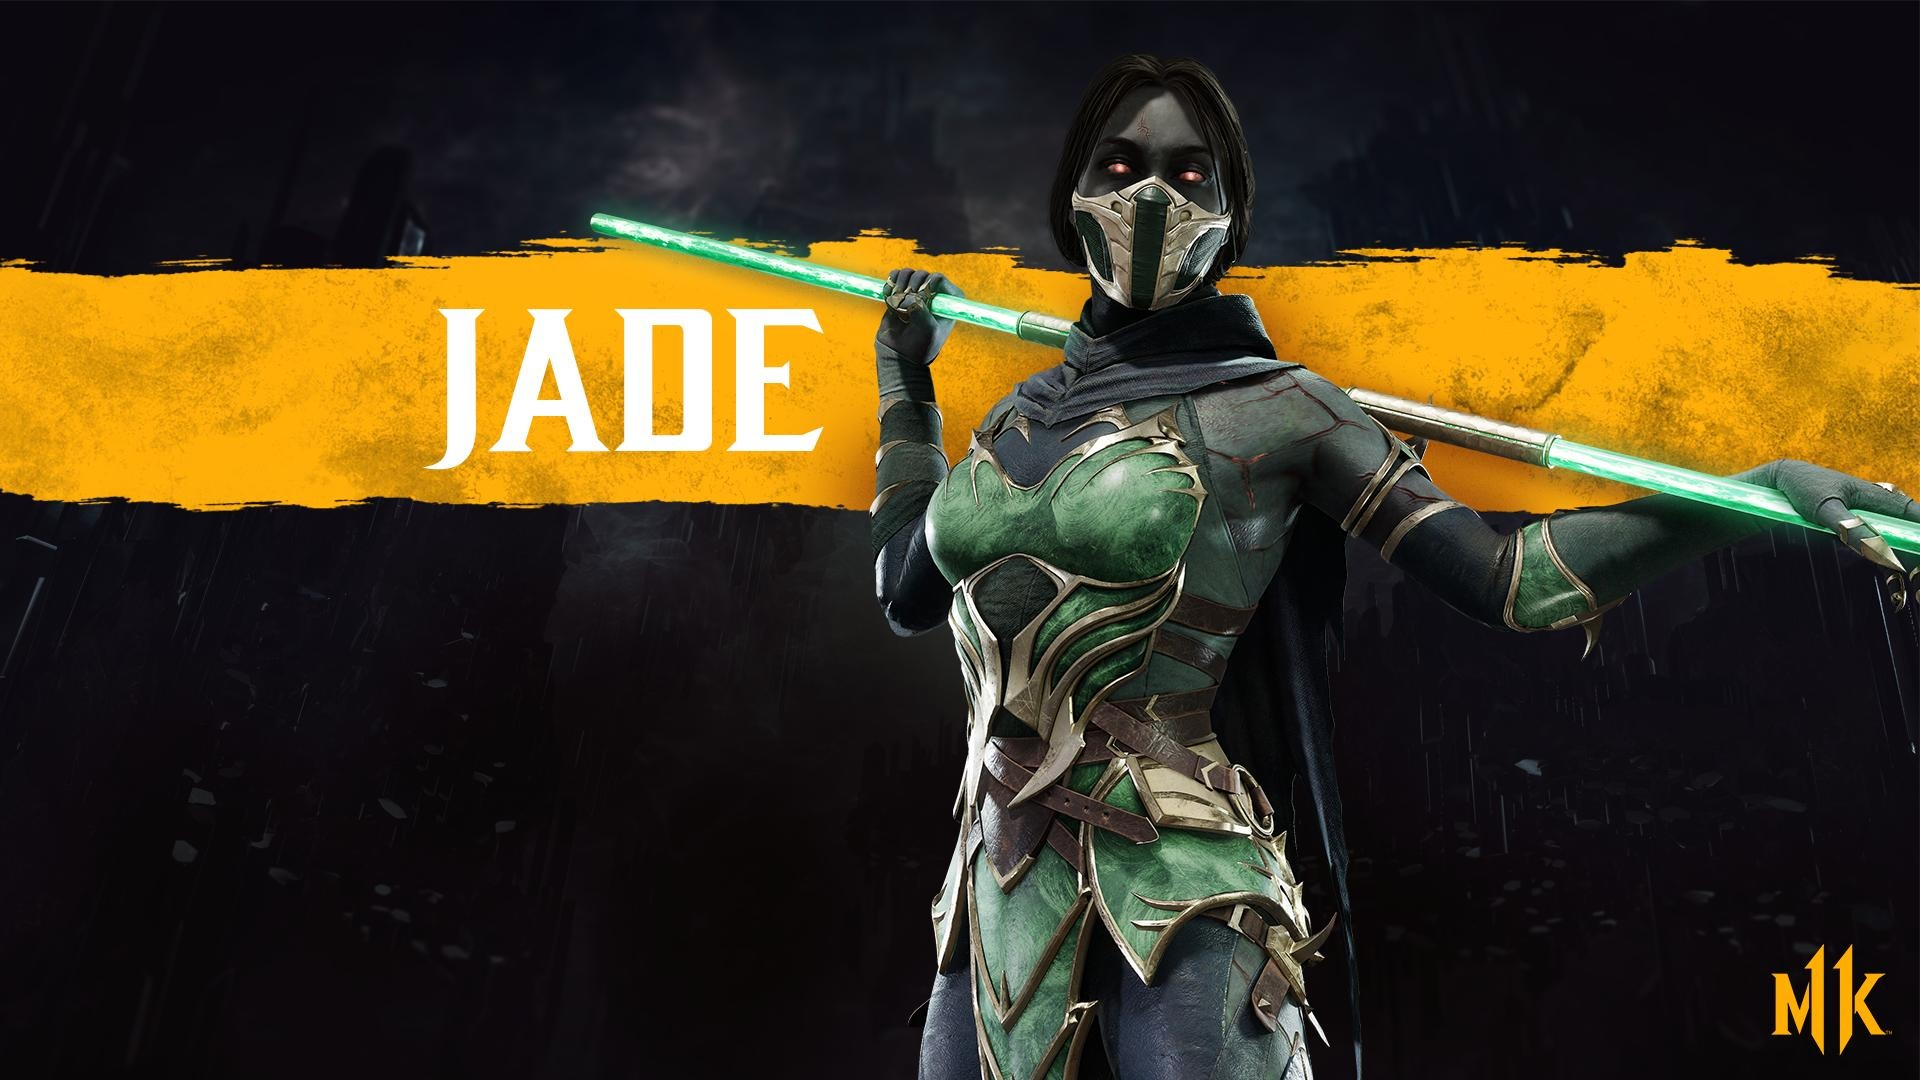 Mk11 Wallpaper: Mortal Kombat 11 Brings Jade Back Into The Fold